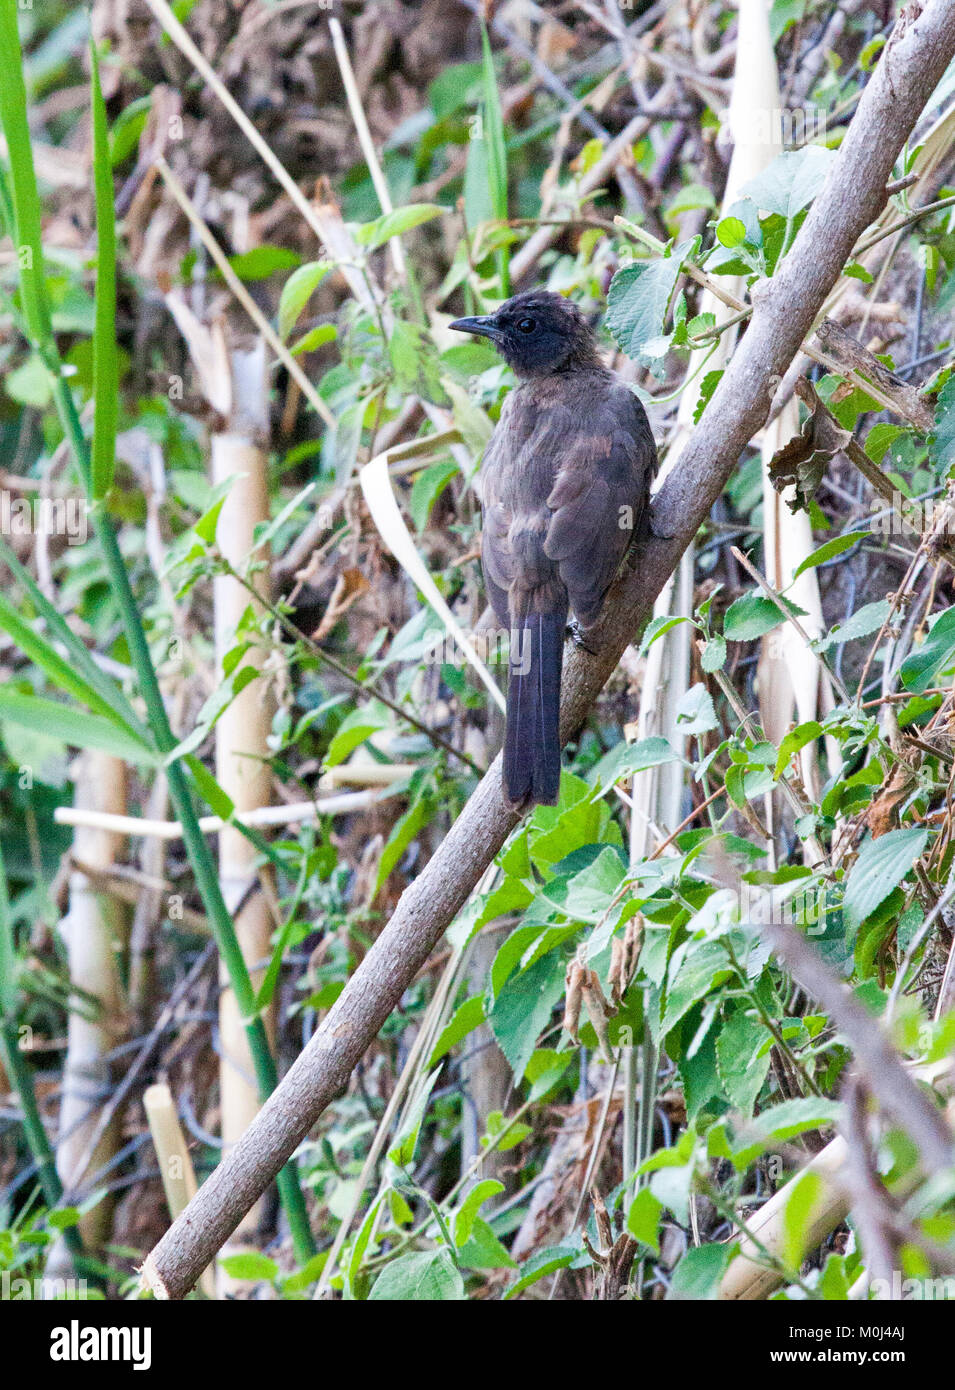 Northern black flycatcher (Melaenornis edolioides) perched on branch in garden - Stock Image